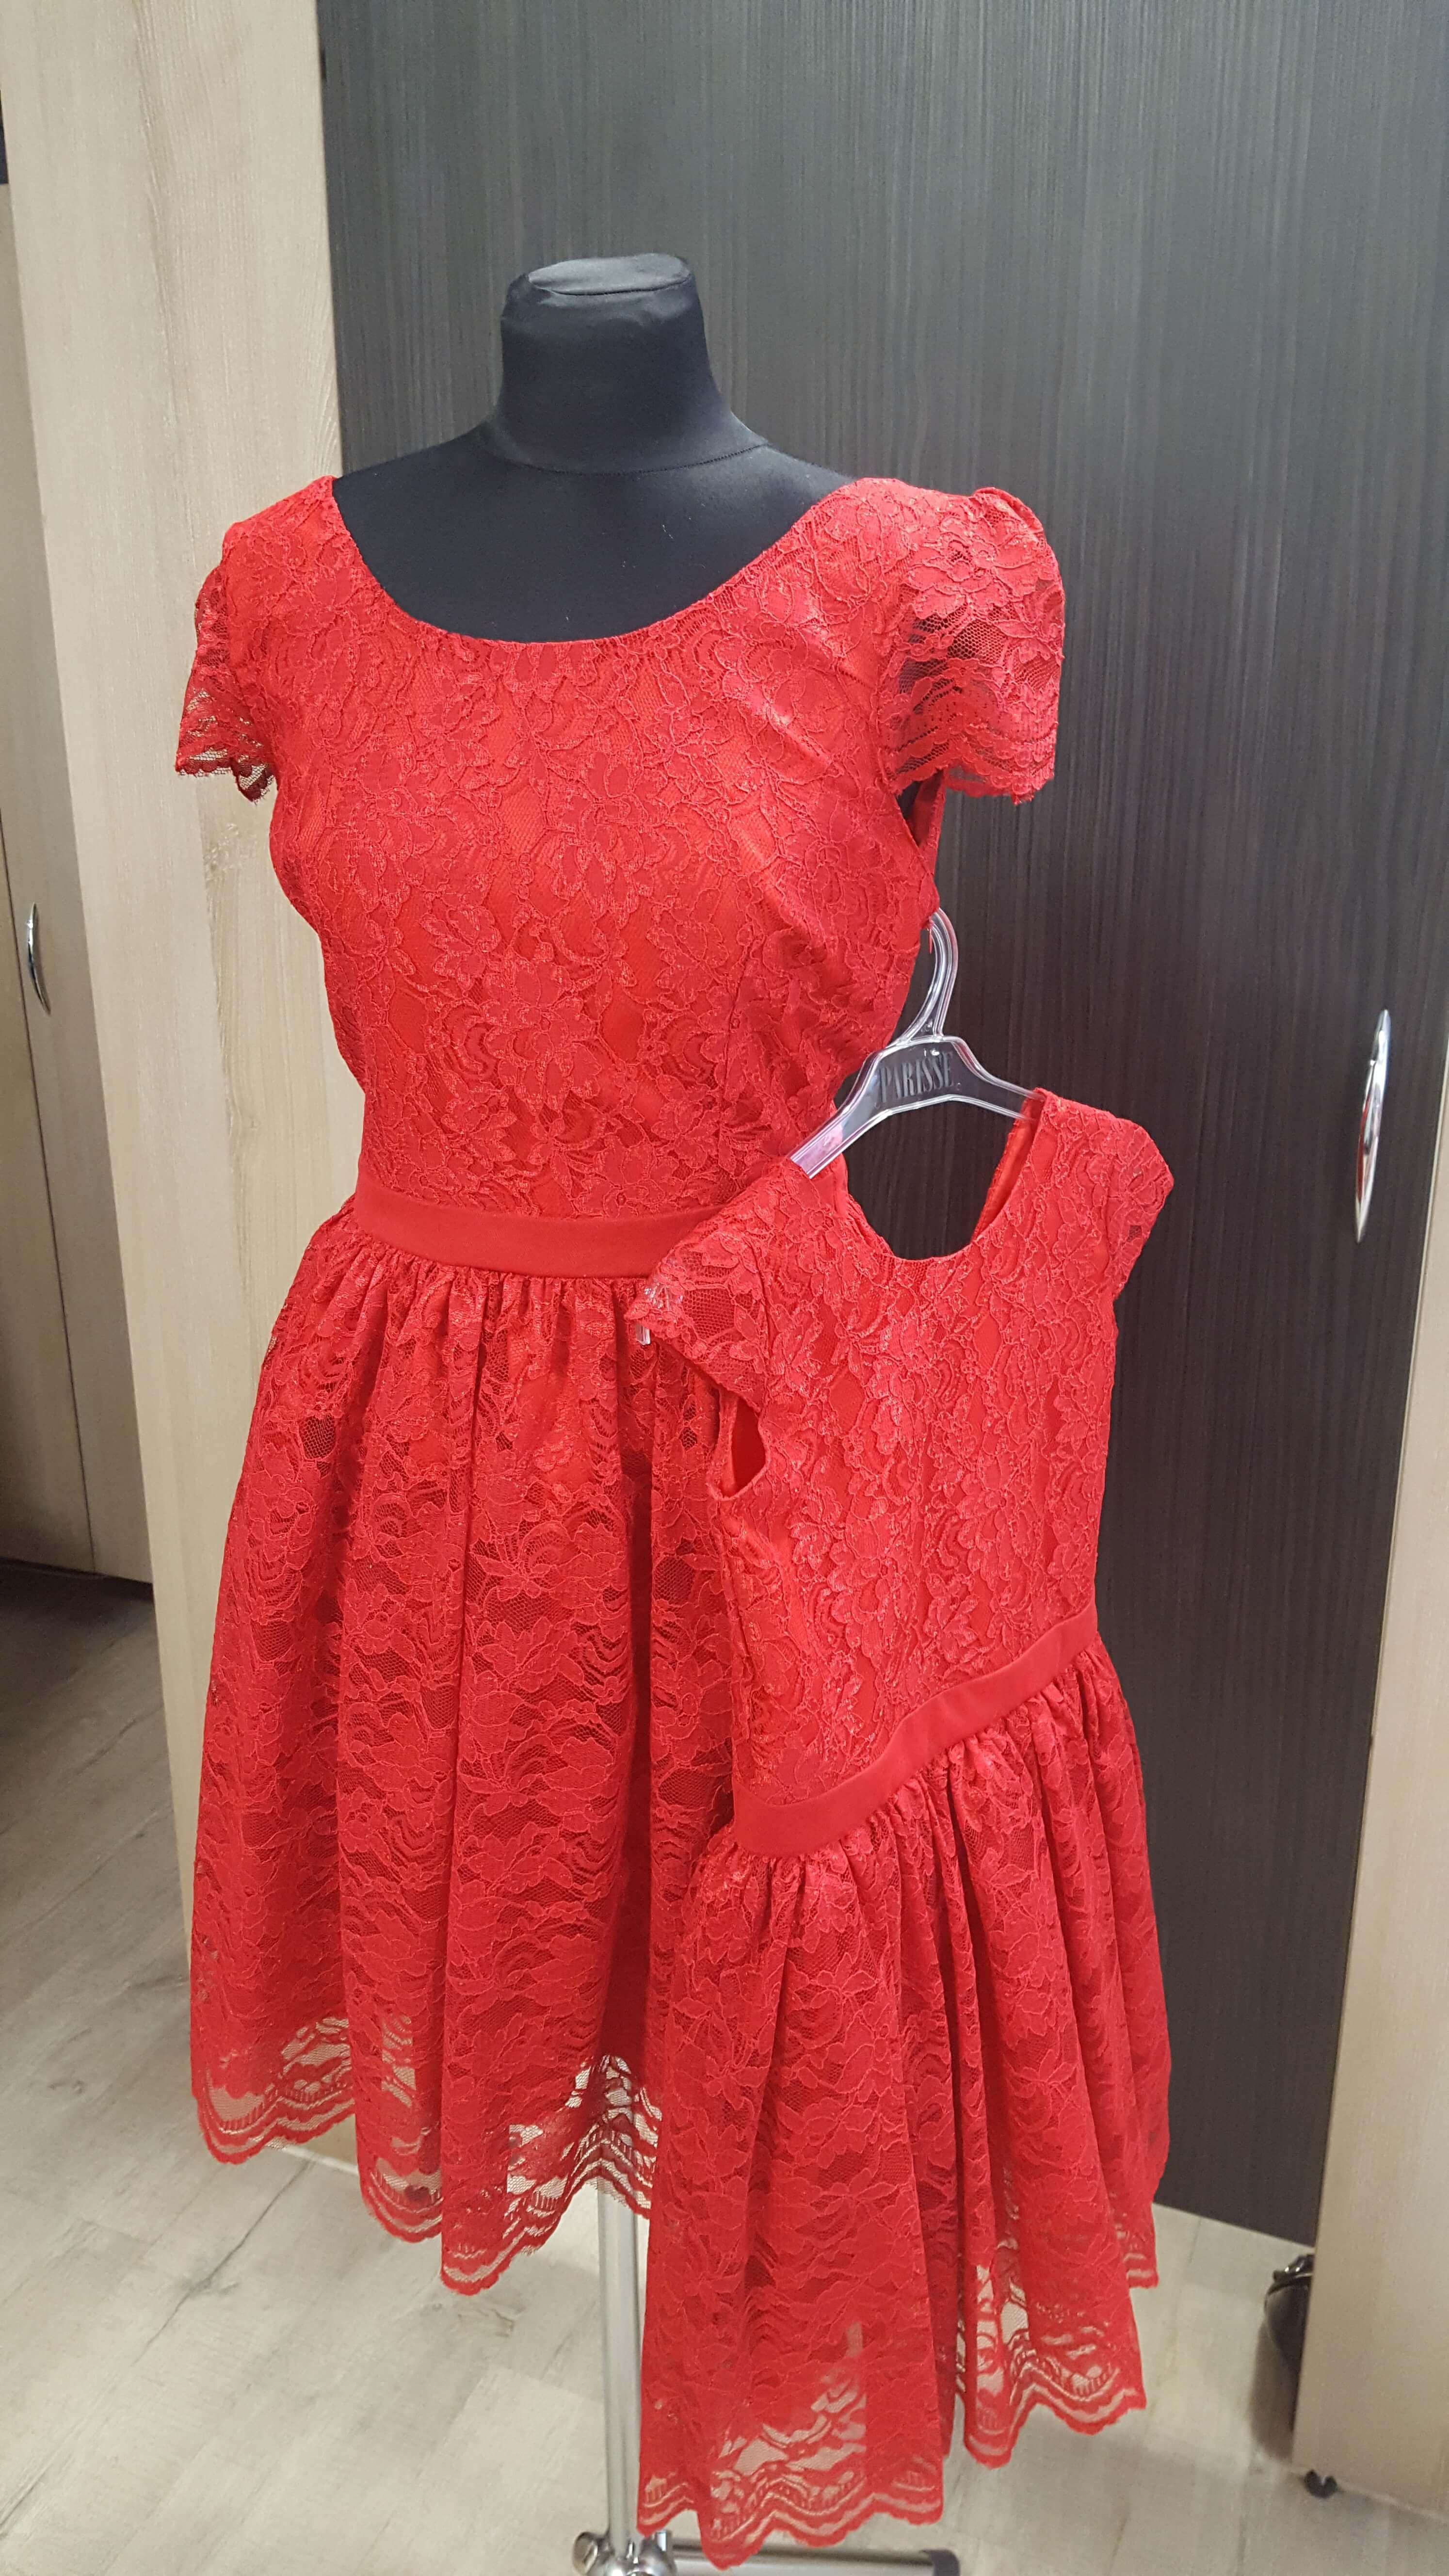 f806b4d96 Červené čipkované šaty pre mamu a dcéru Lilly01 | gyerekruha otletek